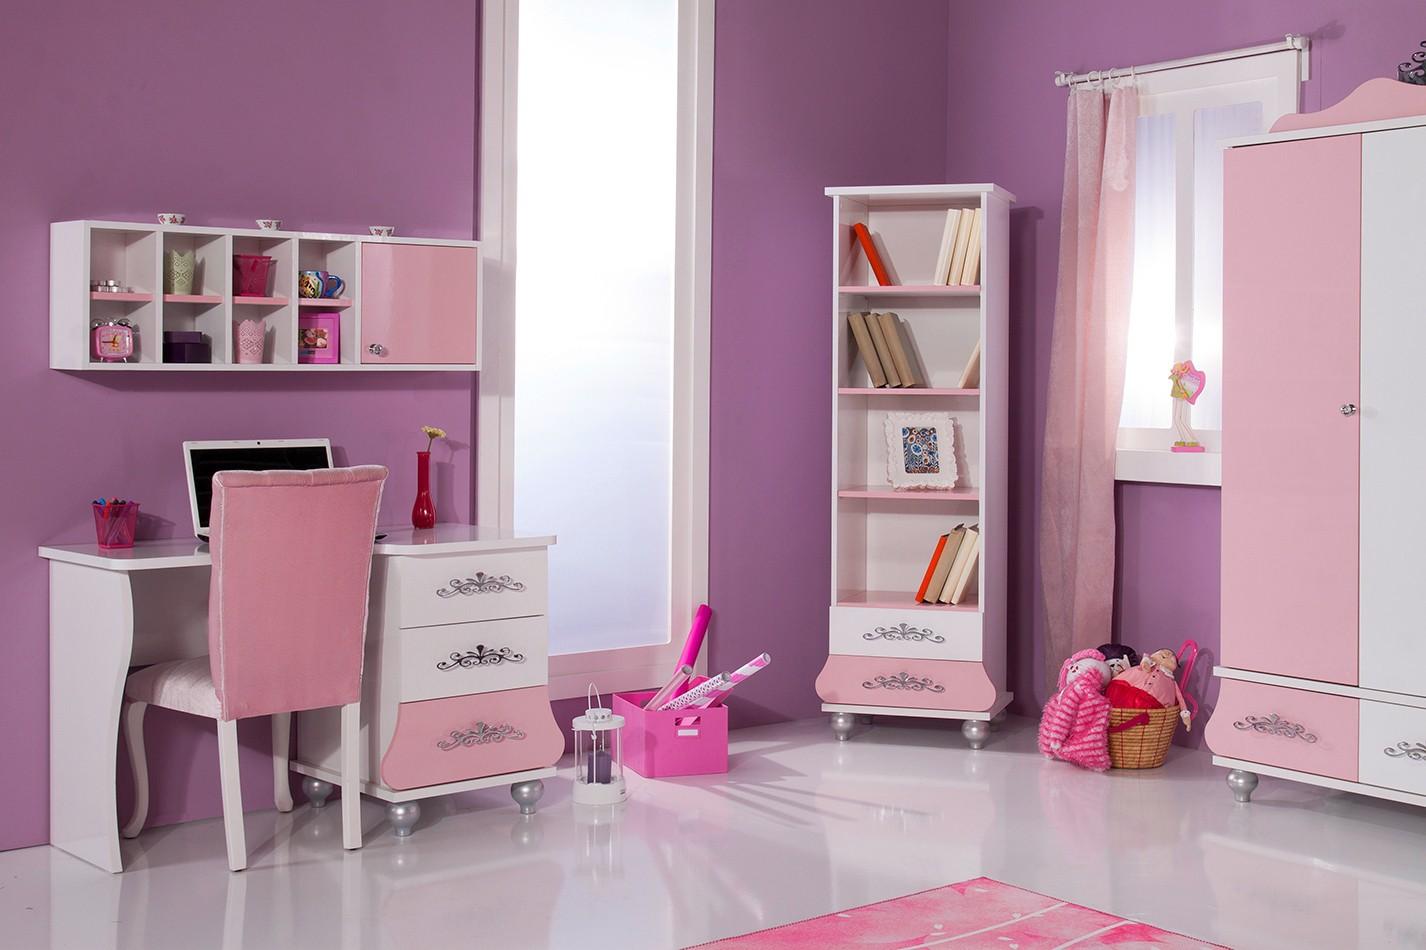 Prinses stoel roze koop je bij Huis en Tuinwereld